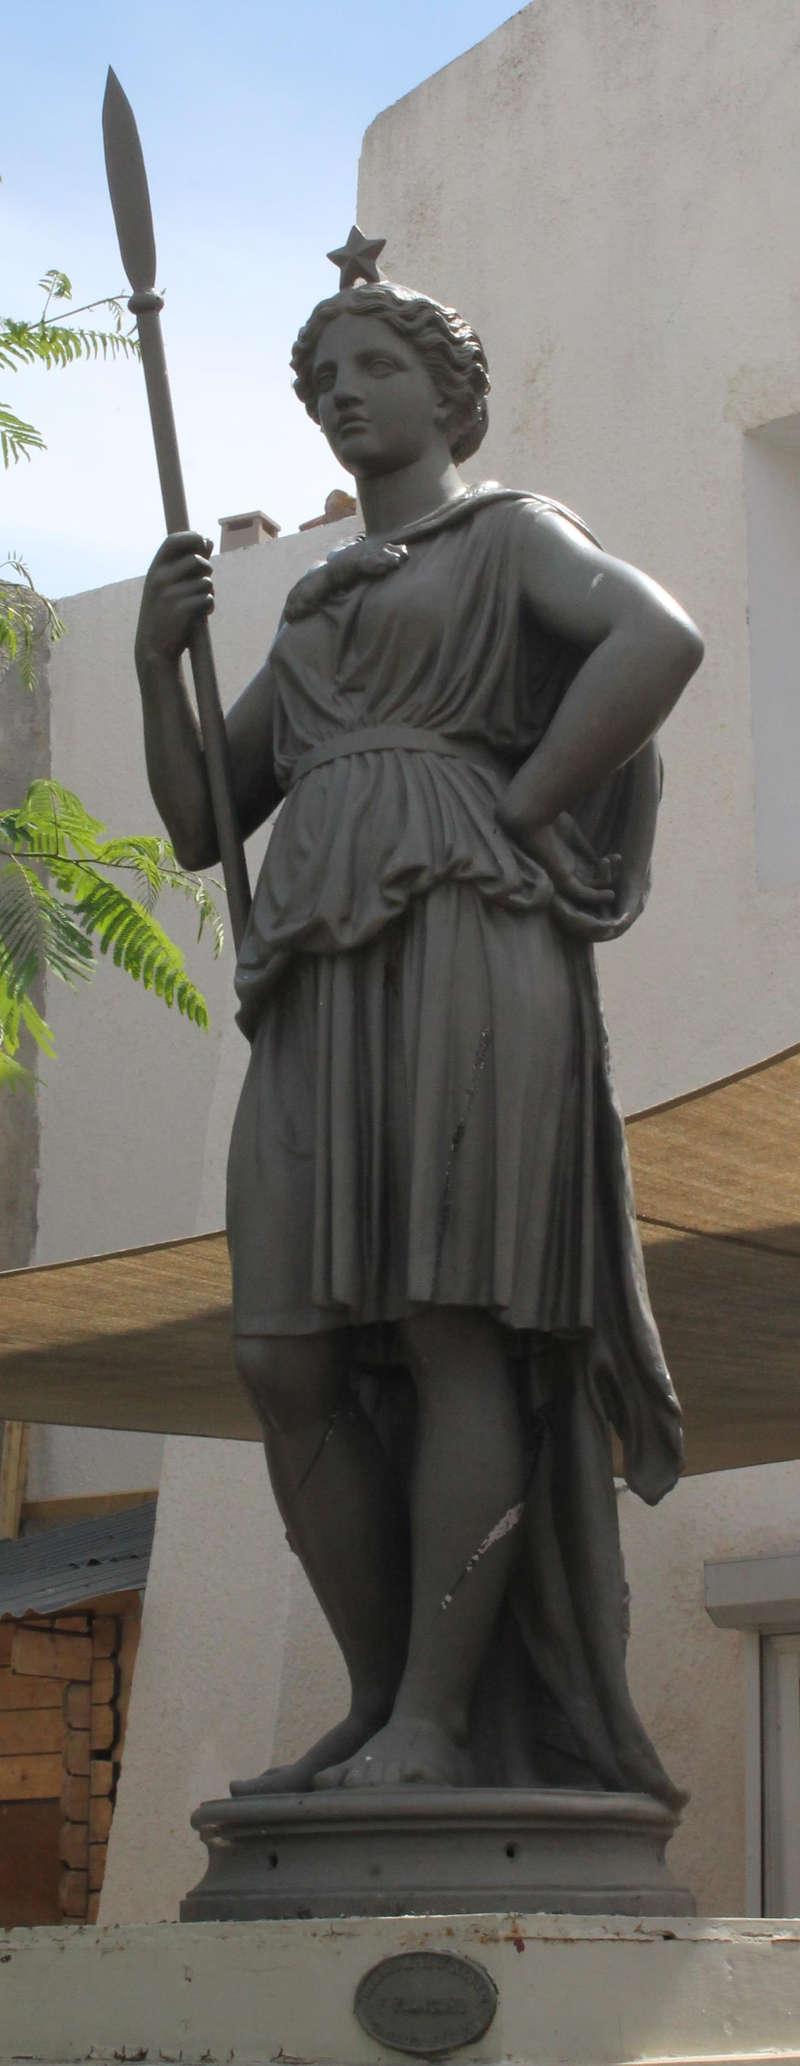 Galerie photo - Marcorignan statue Mariane